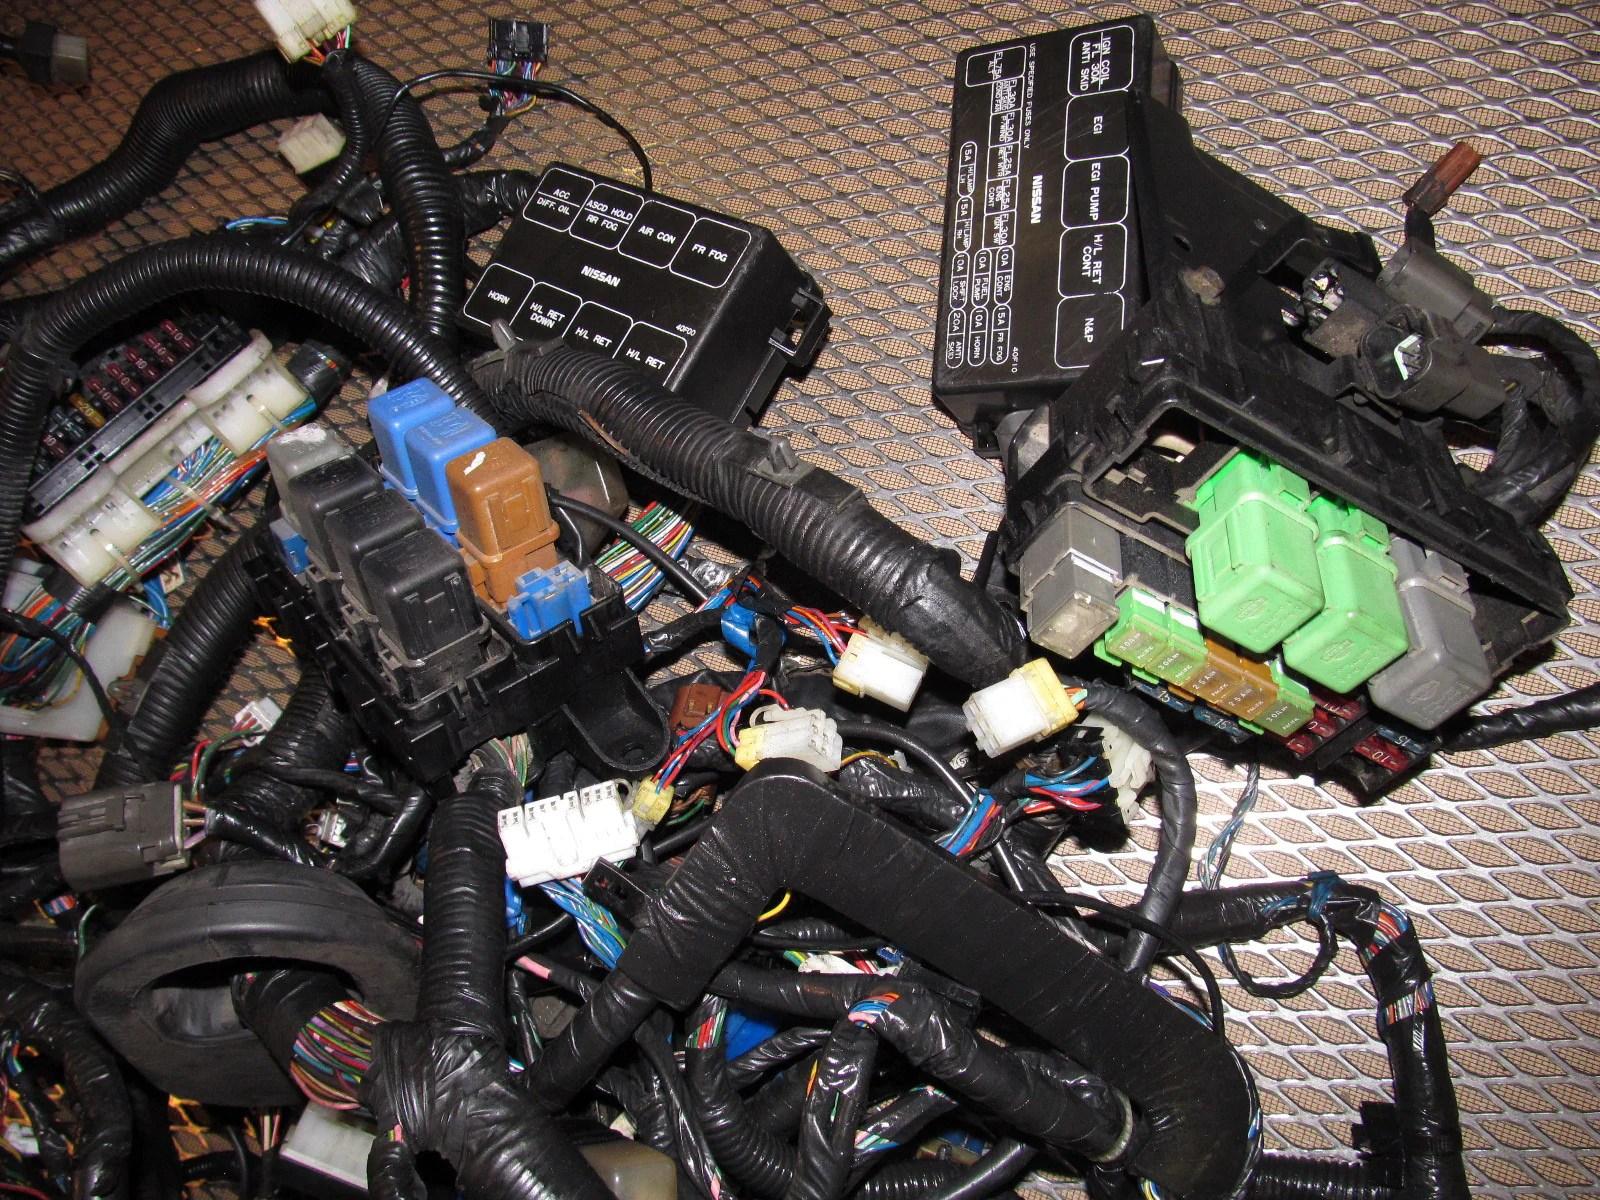 hight resolution of 89 90 nissan 240sx oem fuse box wiring harness autopartone com rh autopartone com 240sx fuel pump fuse 95 98 240sx fuse box interior